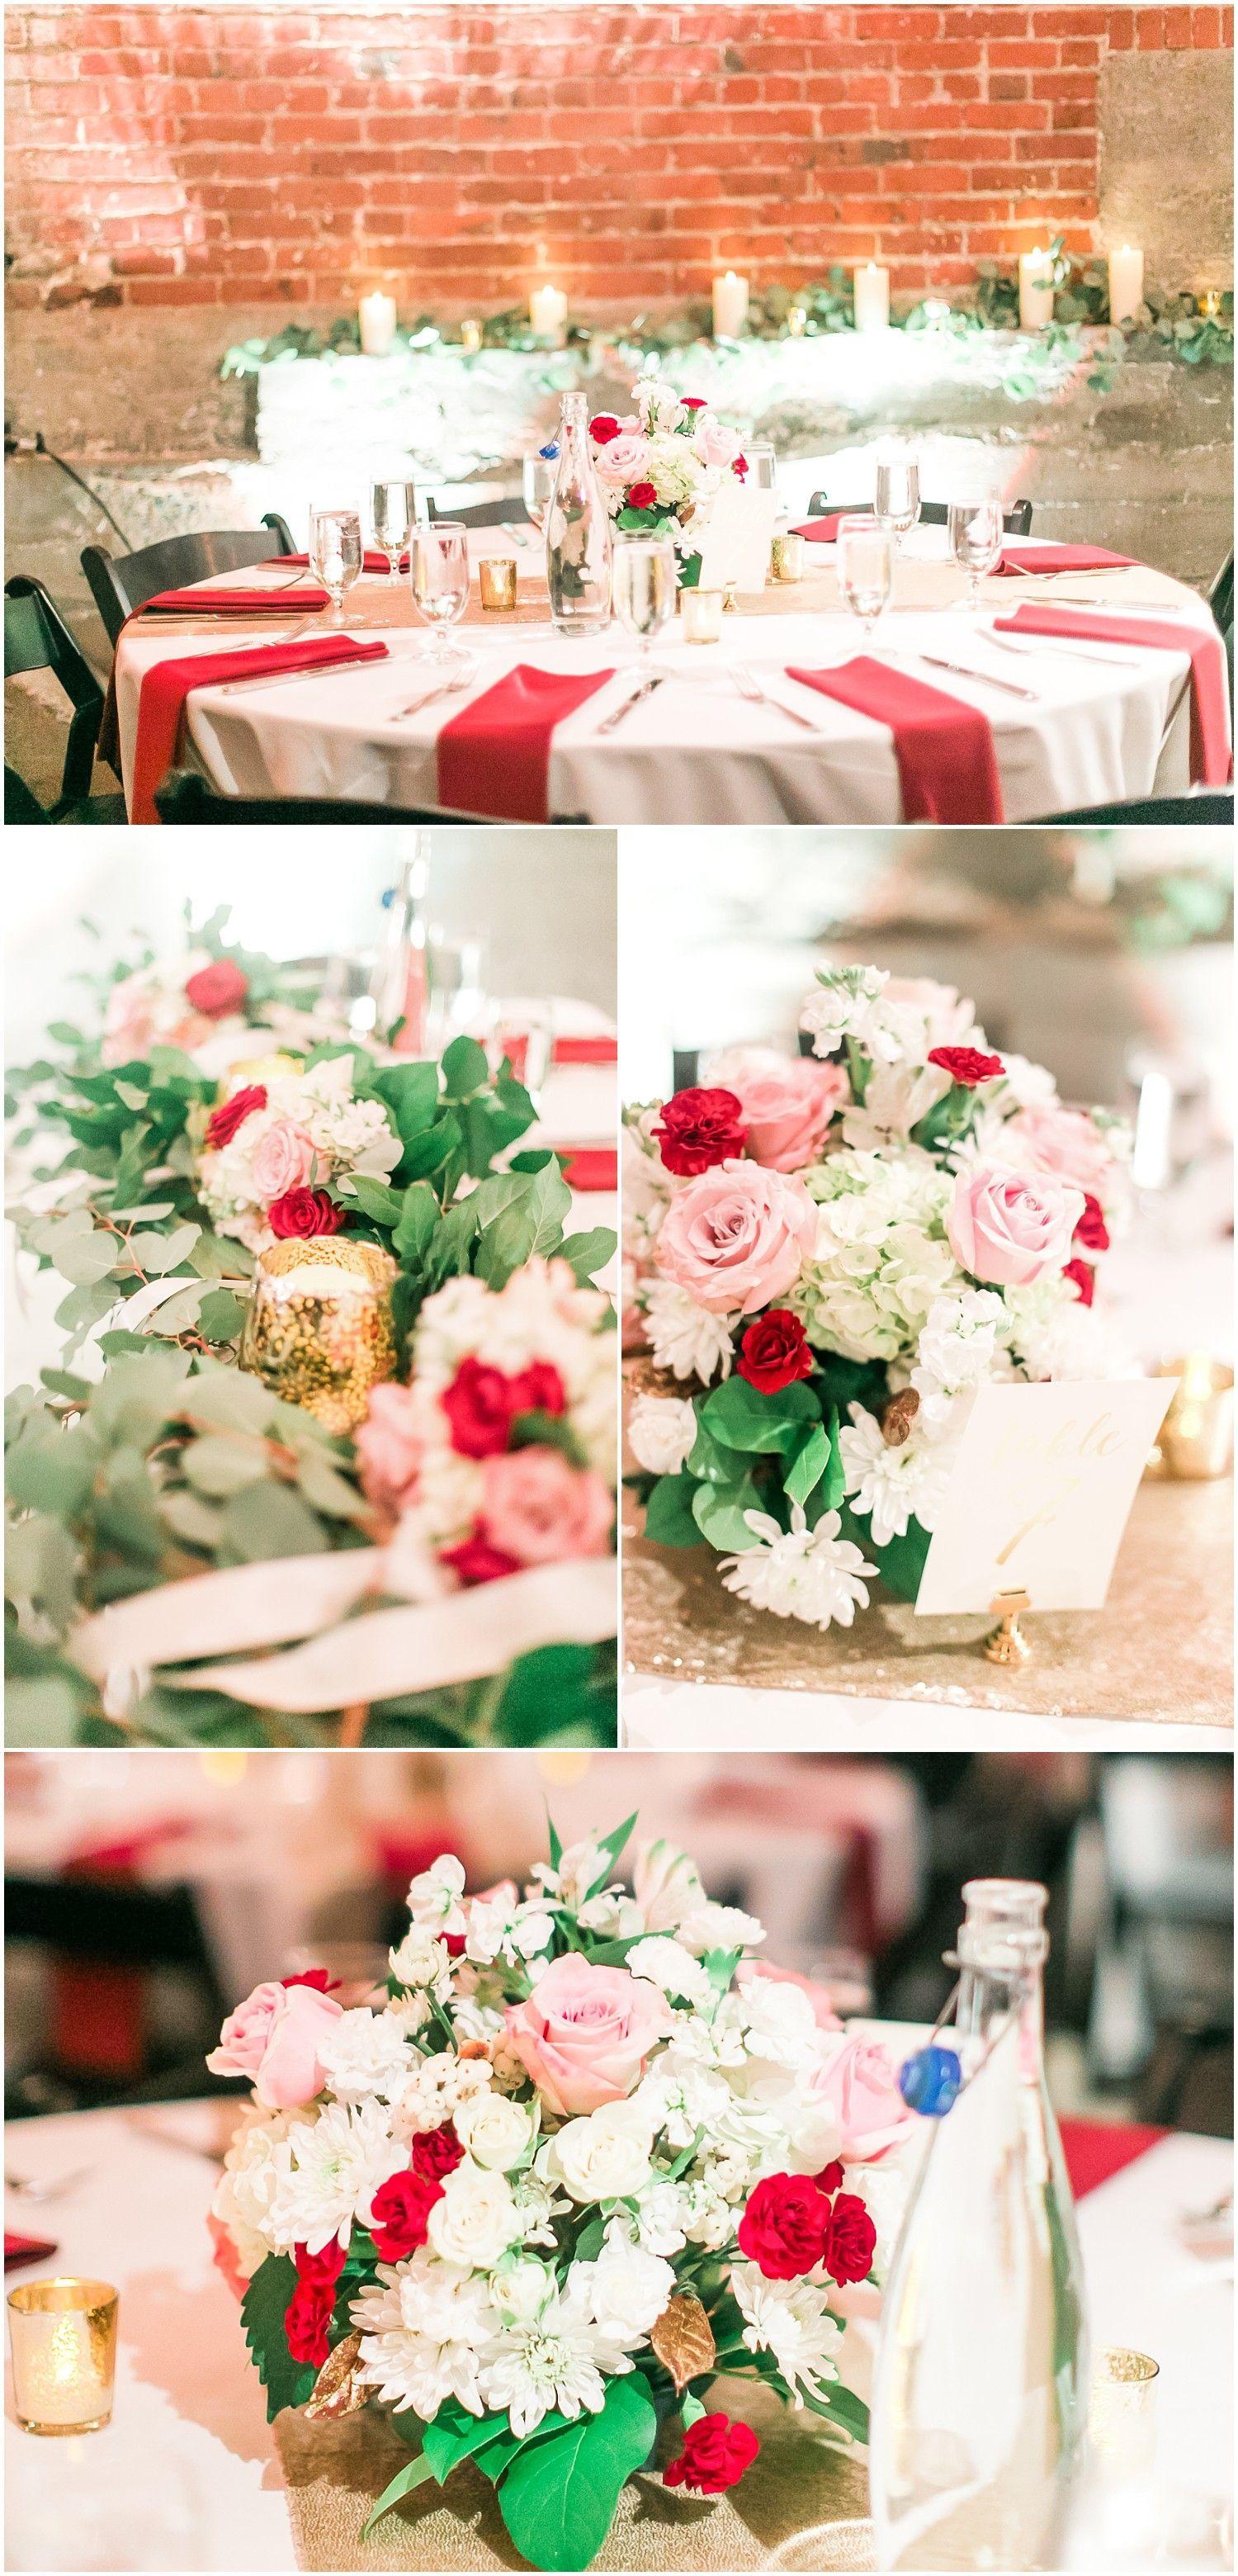 Pink and maroon wedding decor  Melrose Market Studios Wedding  RHP  Wedding Decor  Pinterest